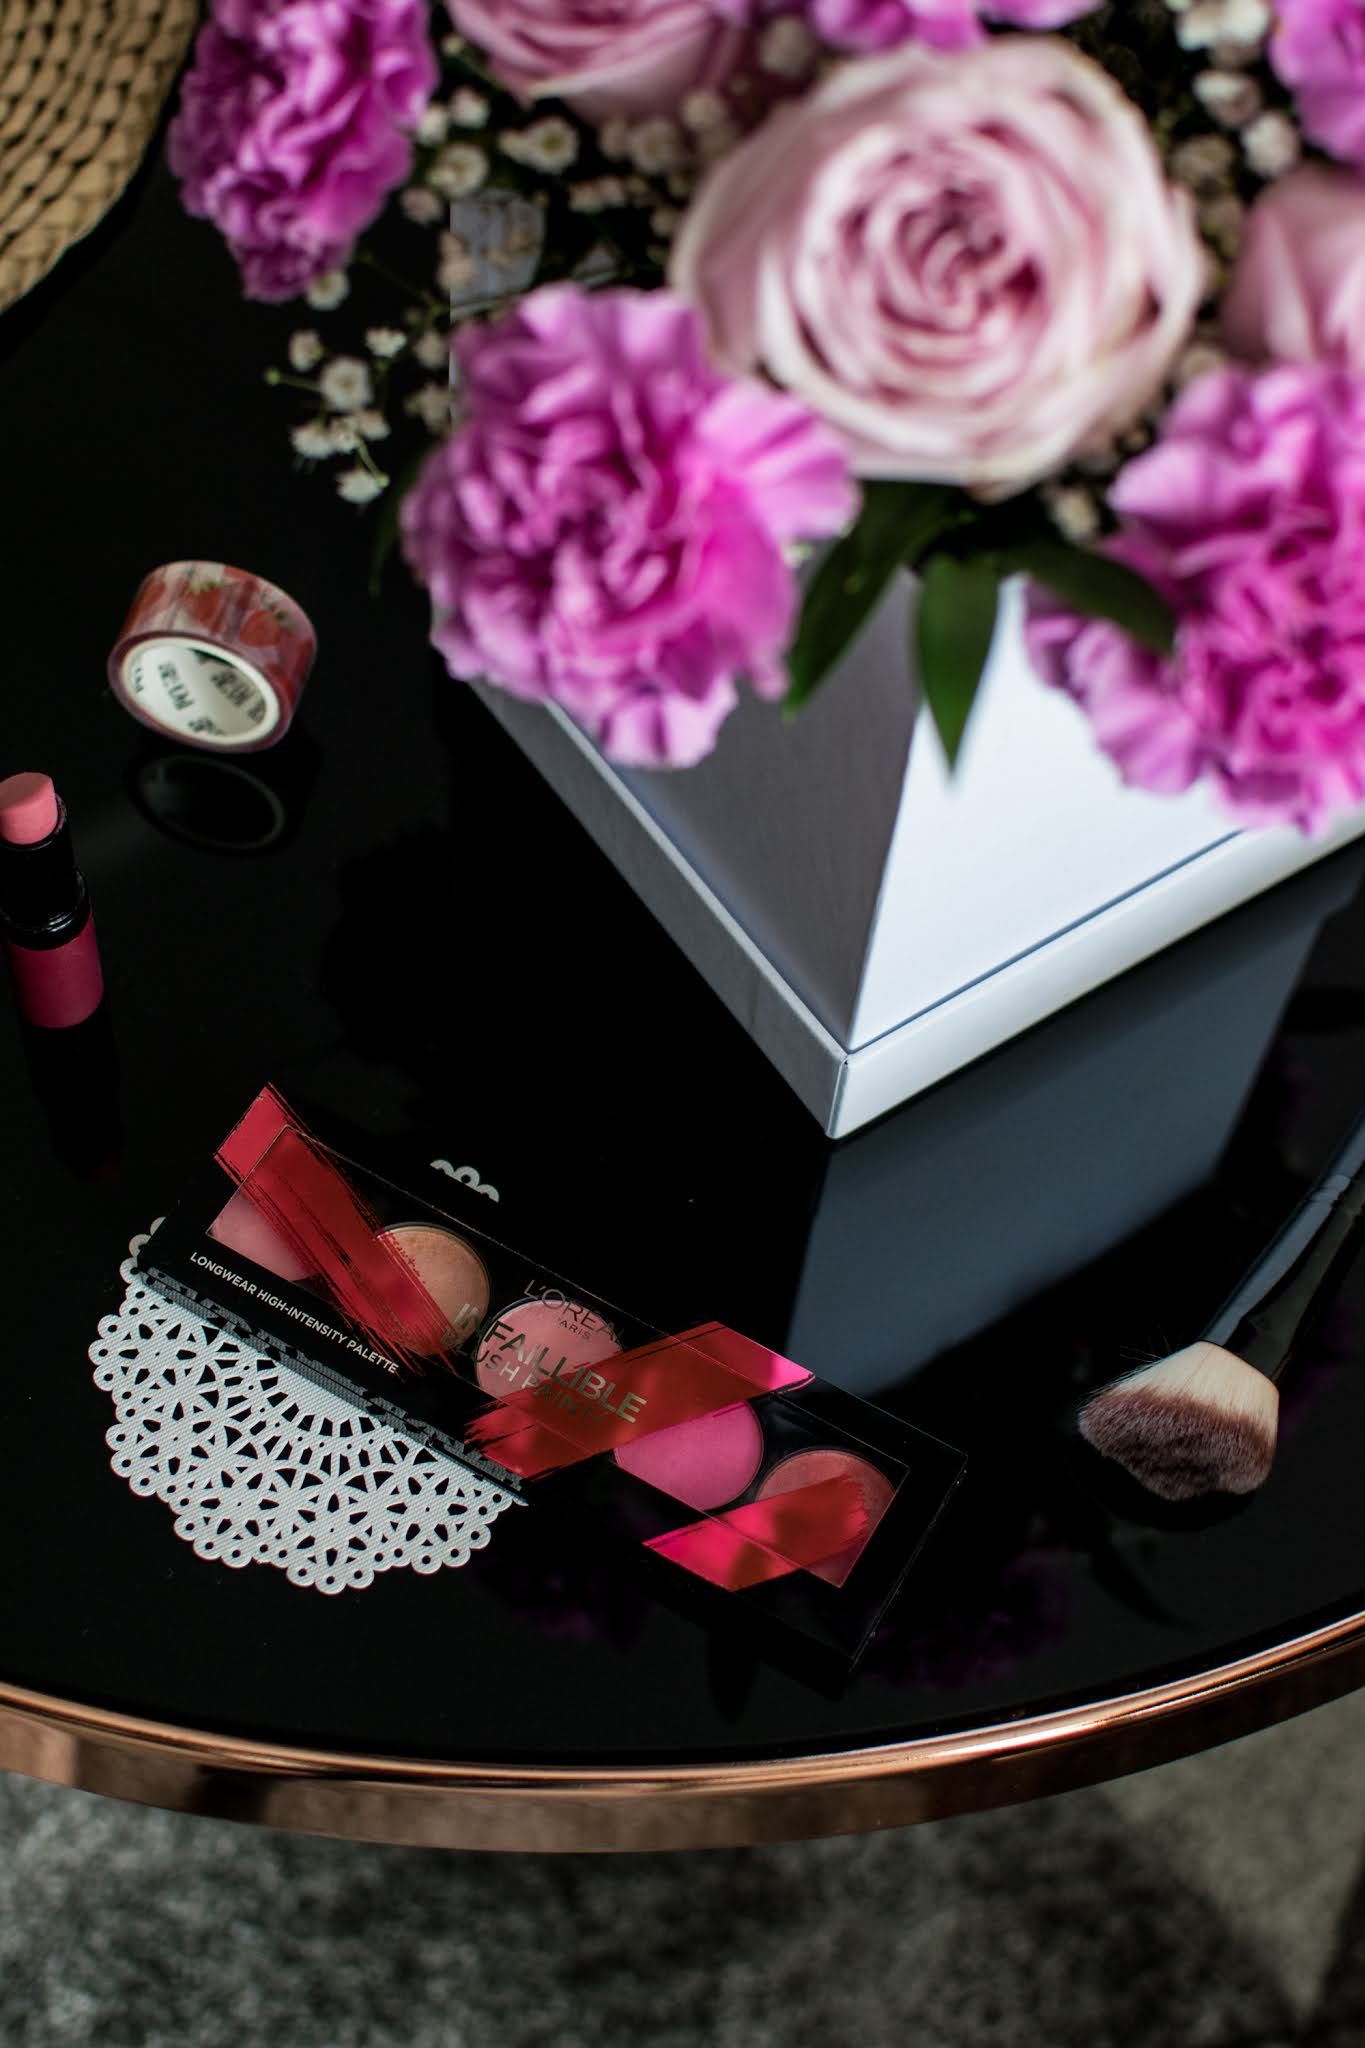 L'Oreal, Infaillible Blush Paint / The Pink | Cukierkowa paleta róży